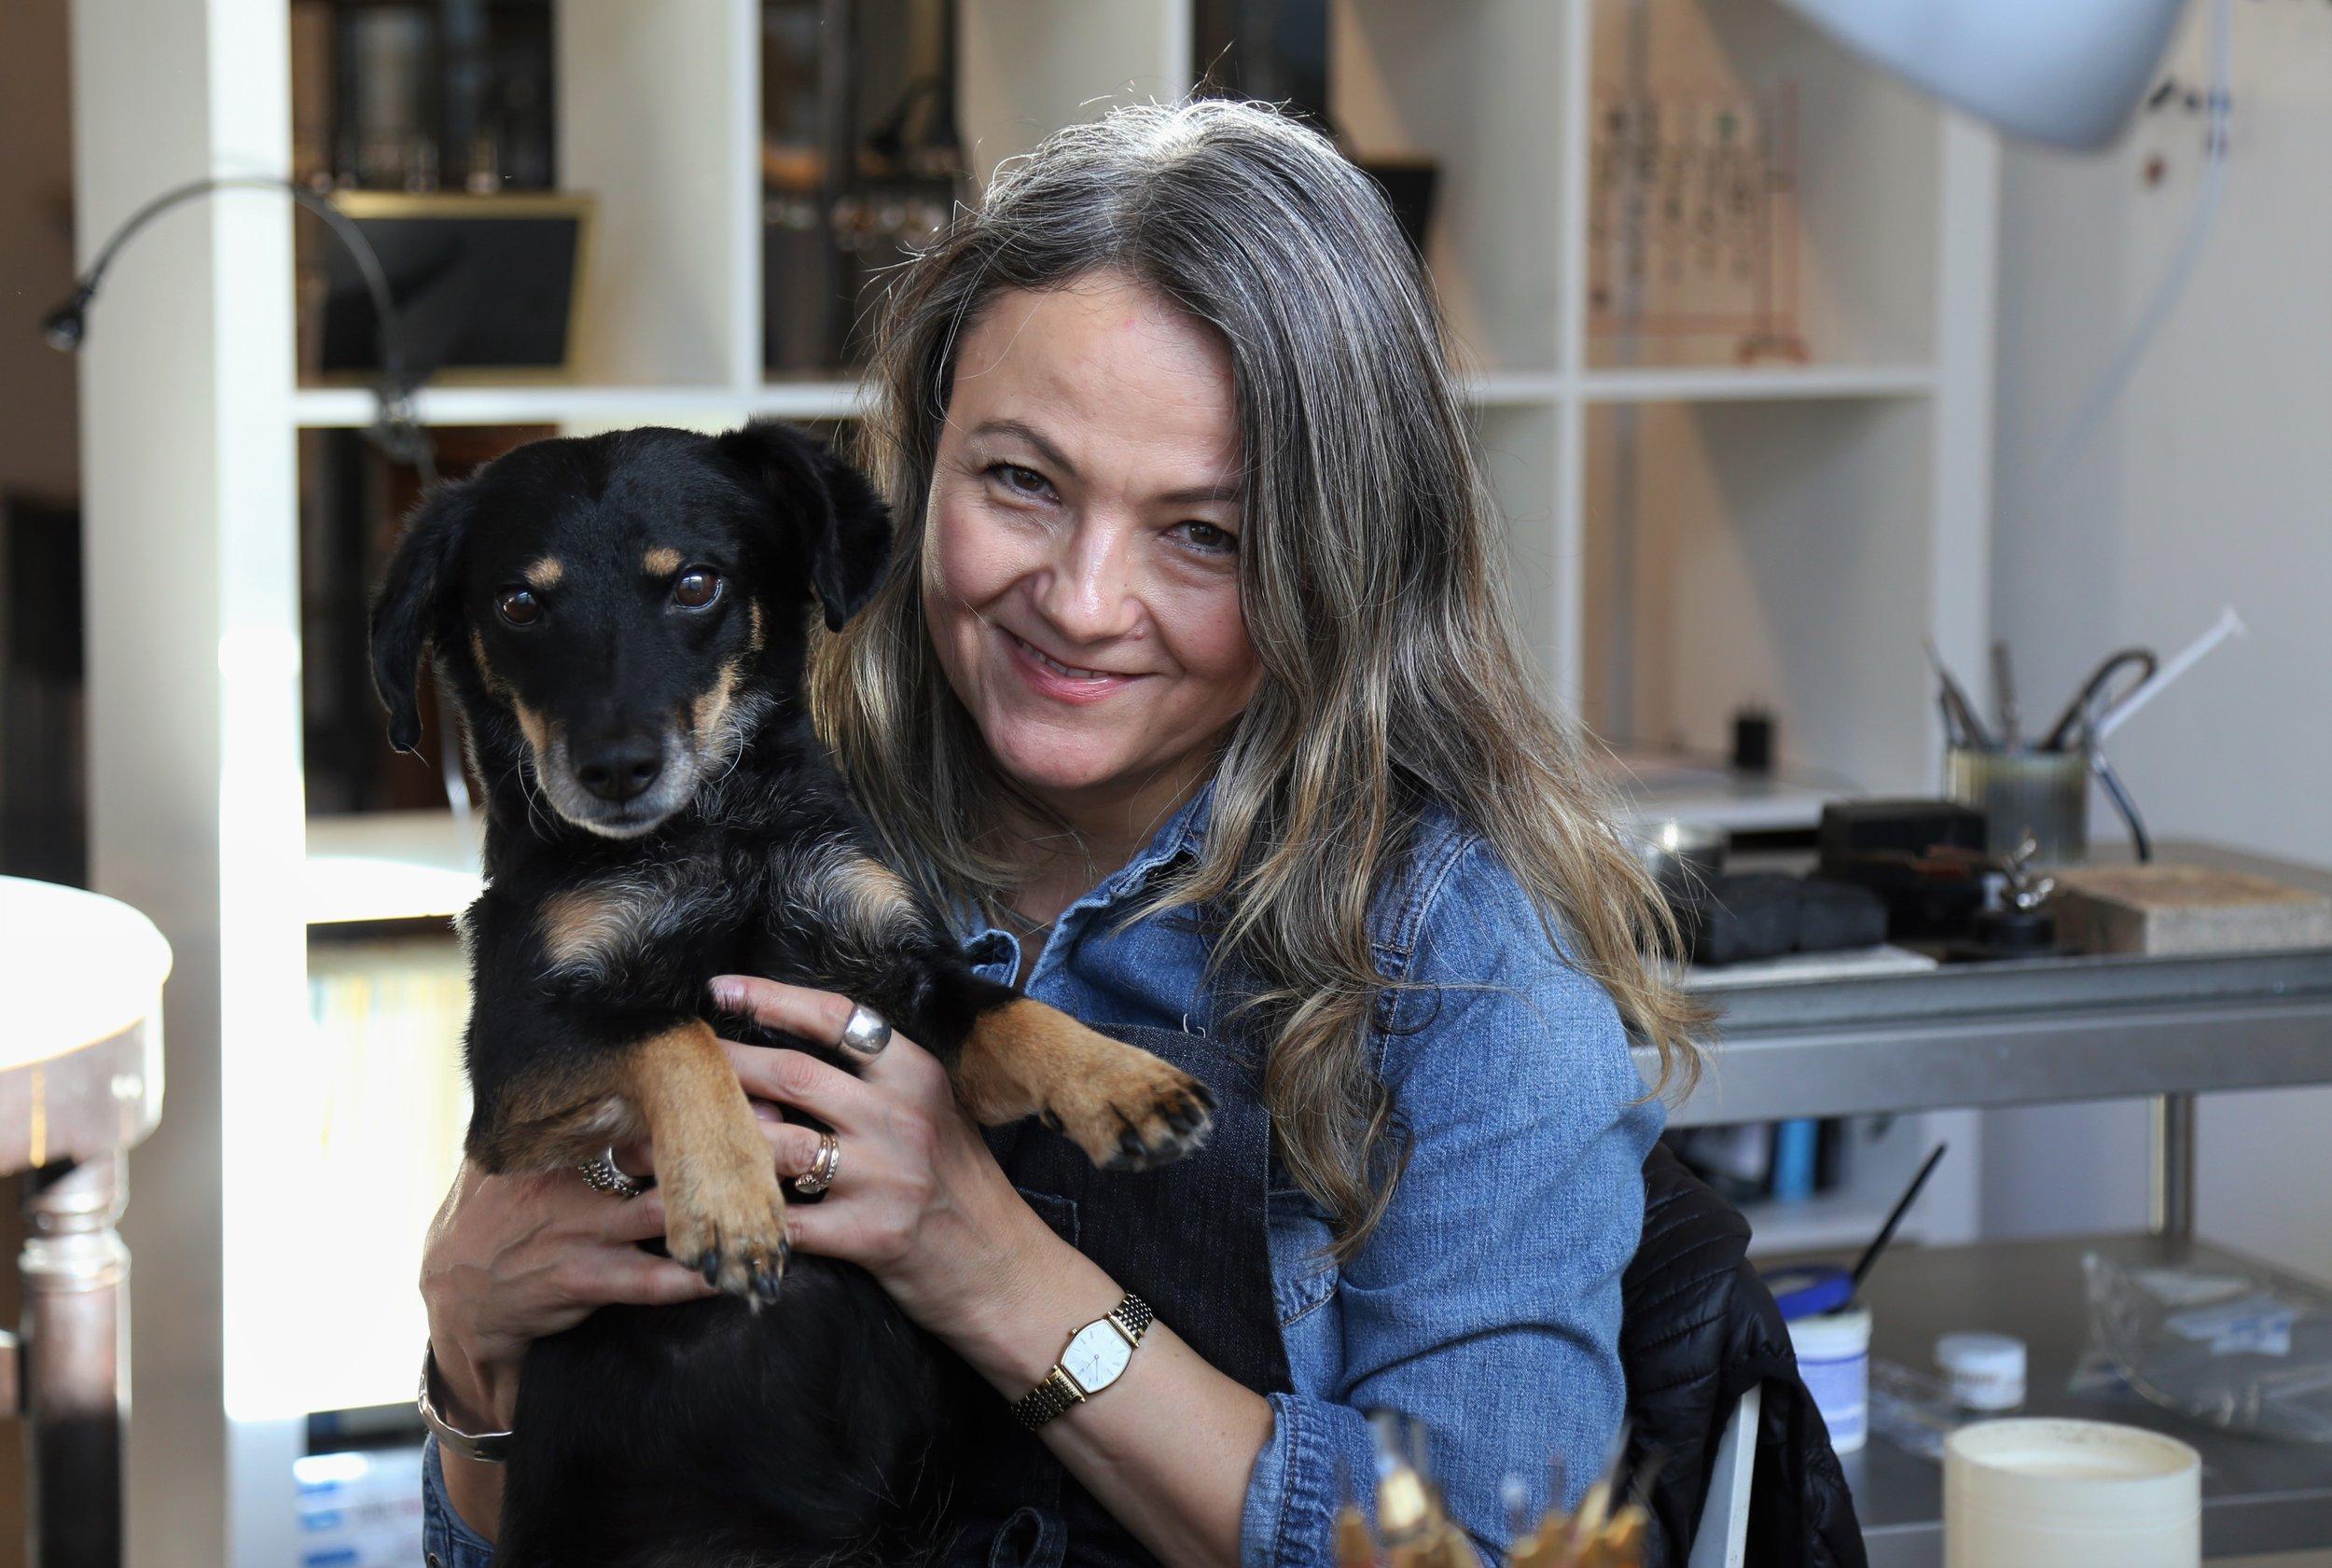 Joanna and her dog, Mandy!